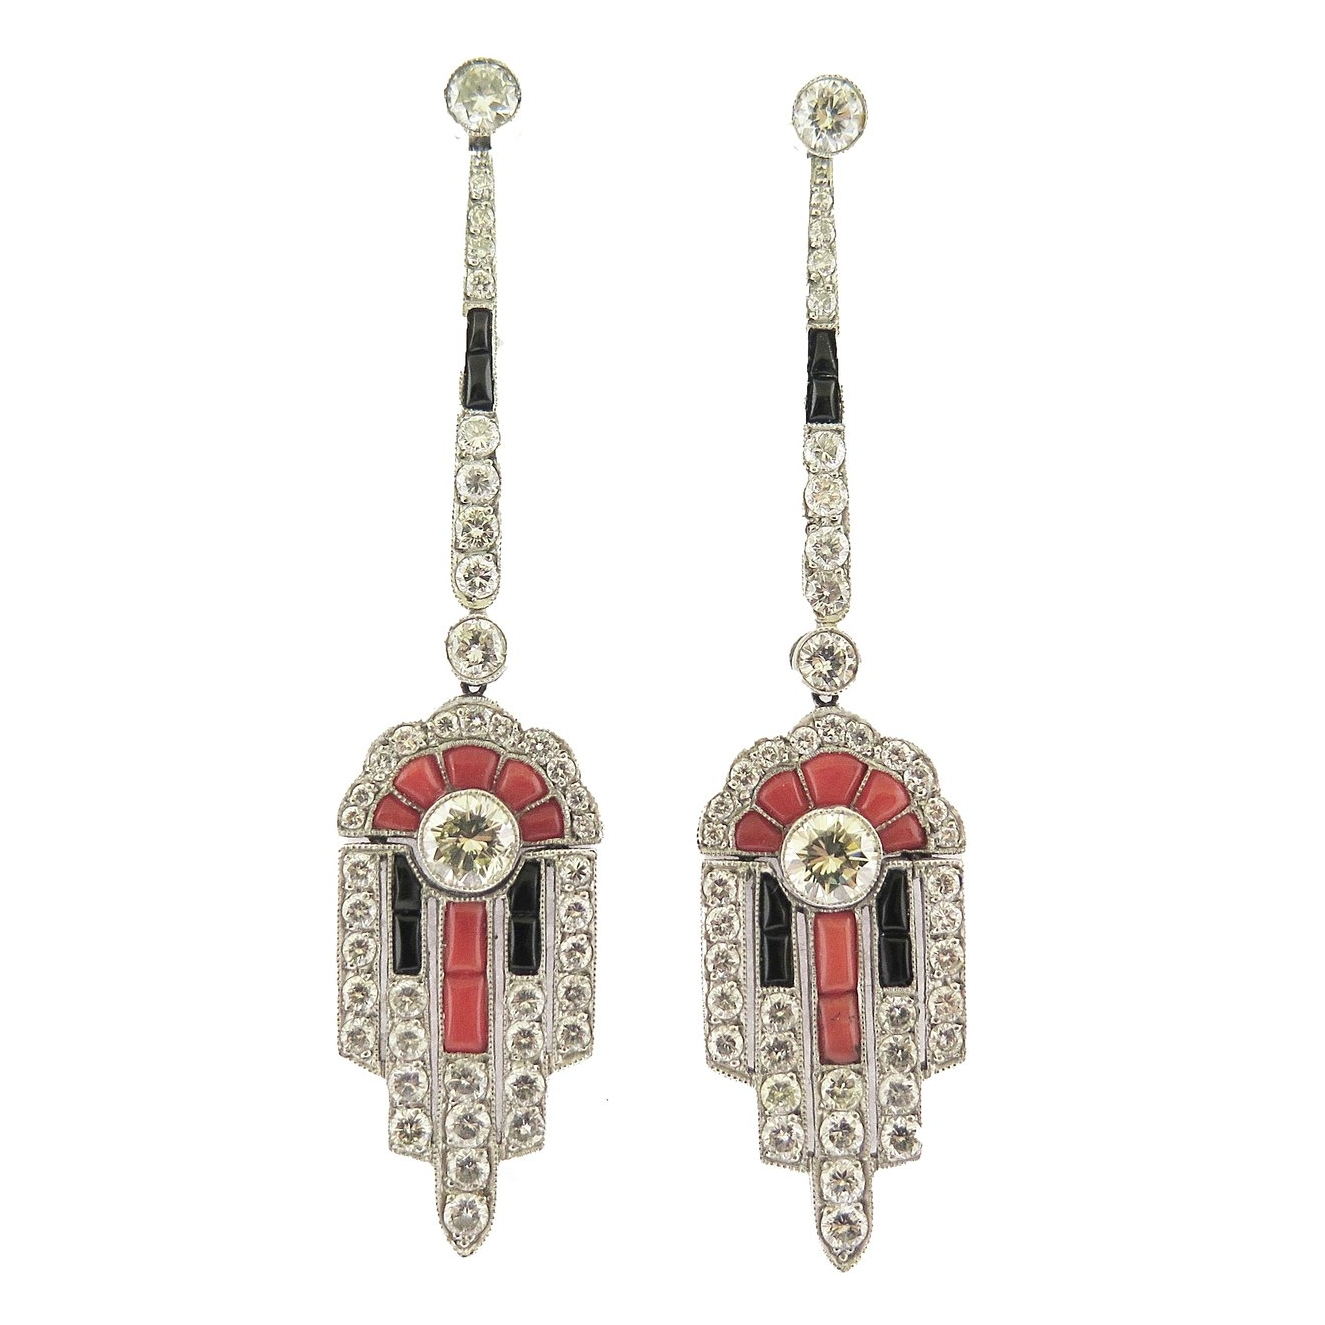 Deco Style Onyx, Coral, and Diamond Ear Pendant